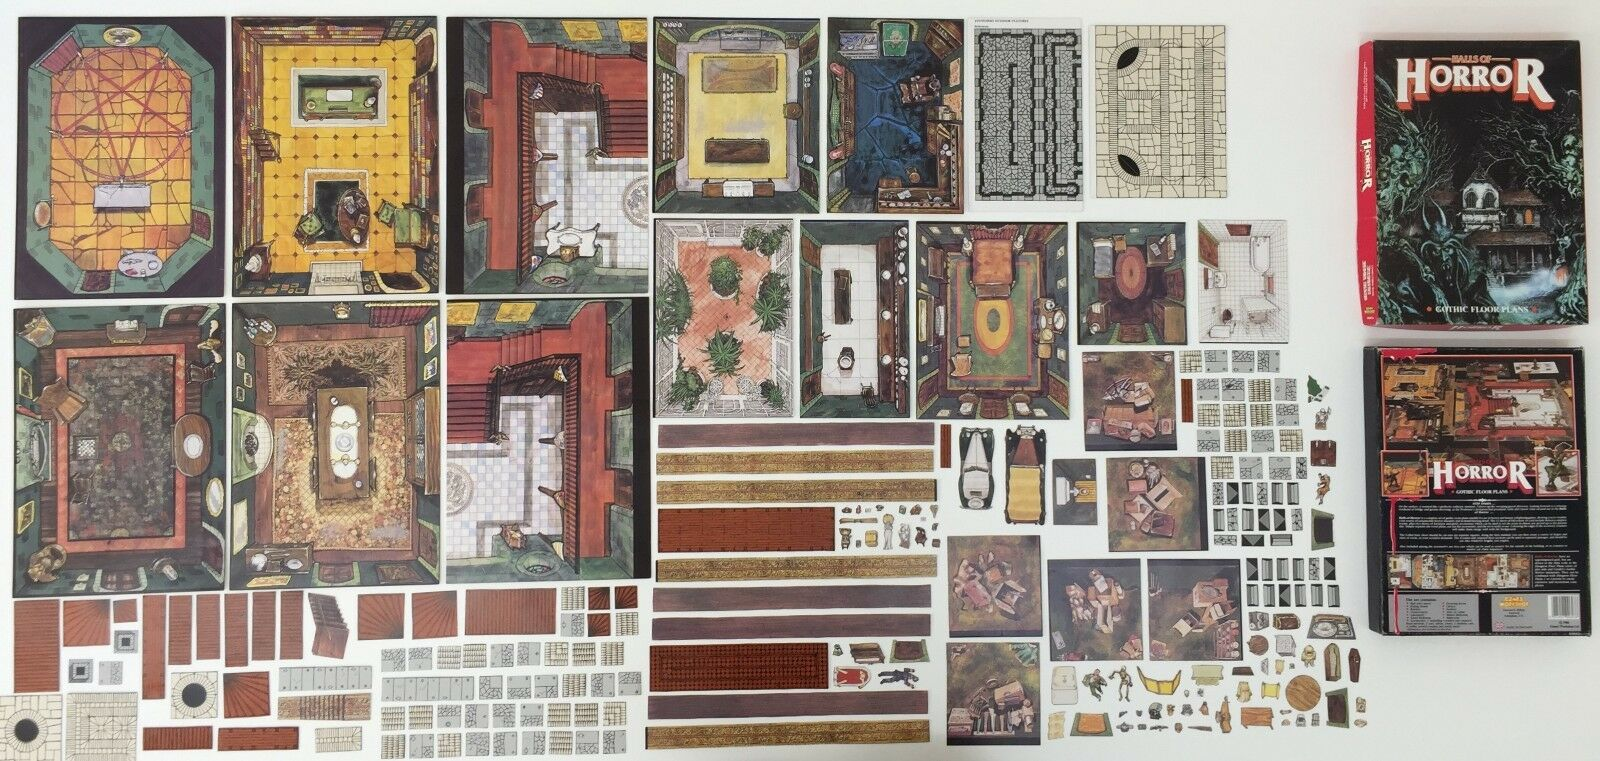 Hall degli Orrori gothic pianta DEI PIANI D&D Ravenloft WFRP Games Workshop (1986)